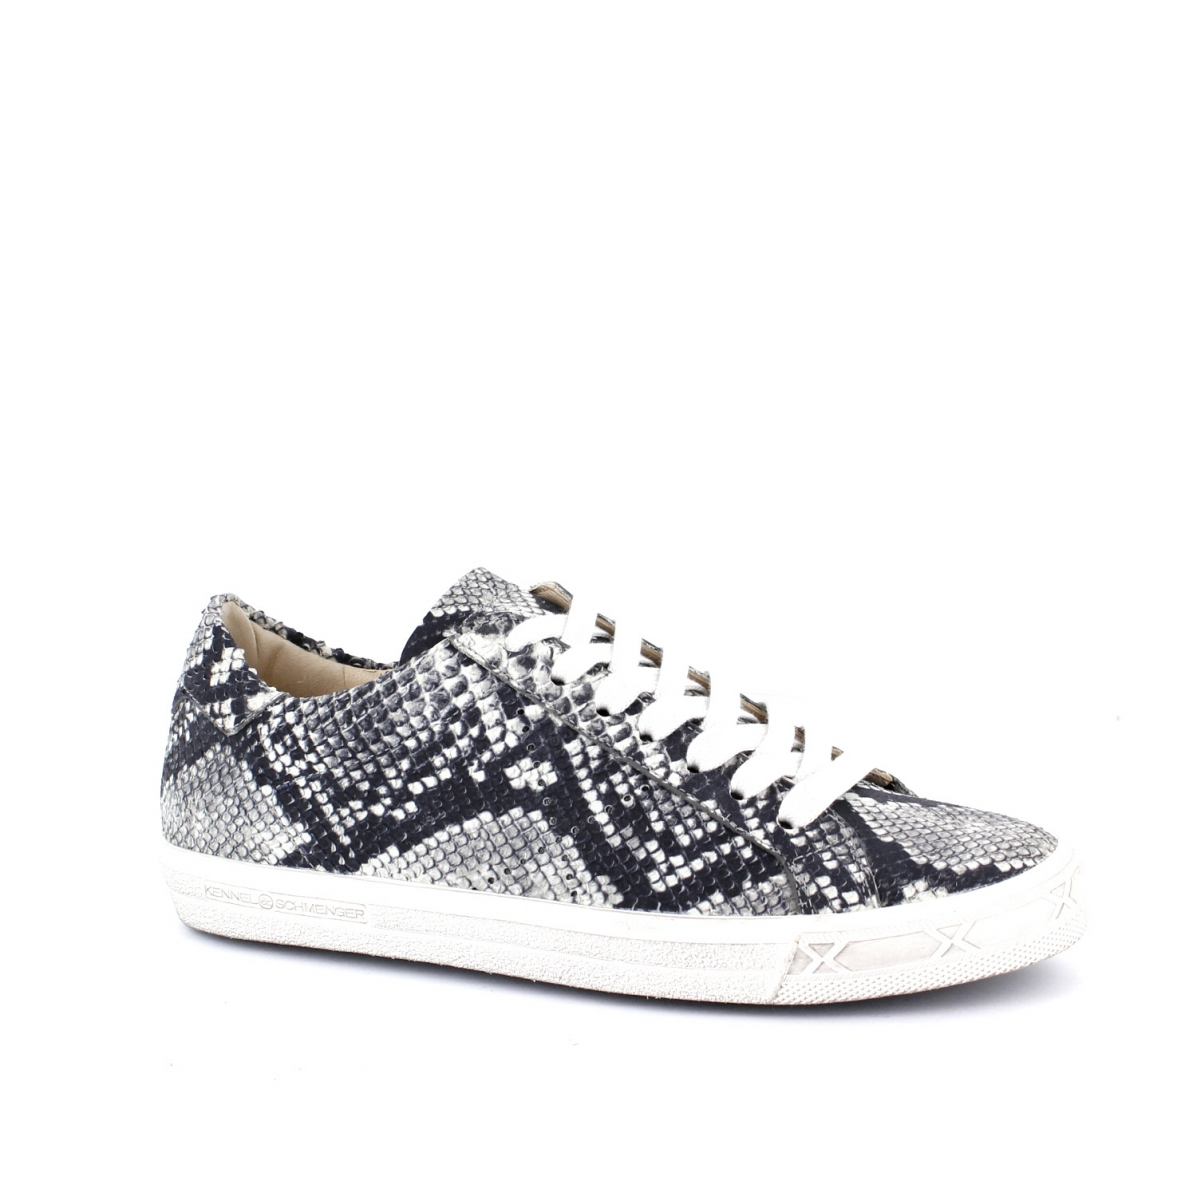 top design buy sale autumn shoes K&S Sneaker - Roccia/weiss   Hillenhinrichs-Schuhmode.de